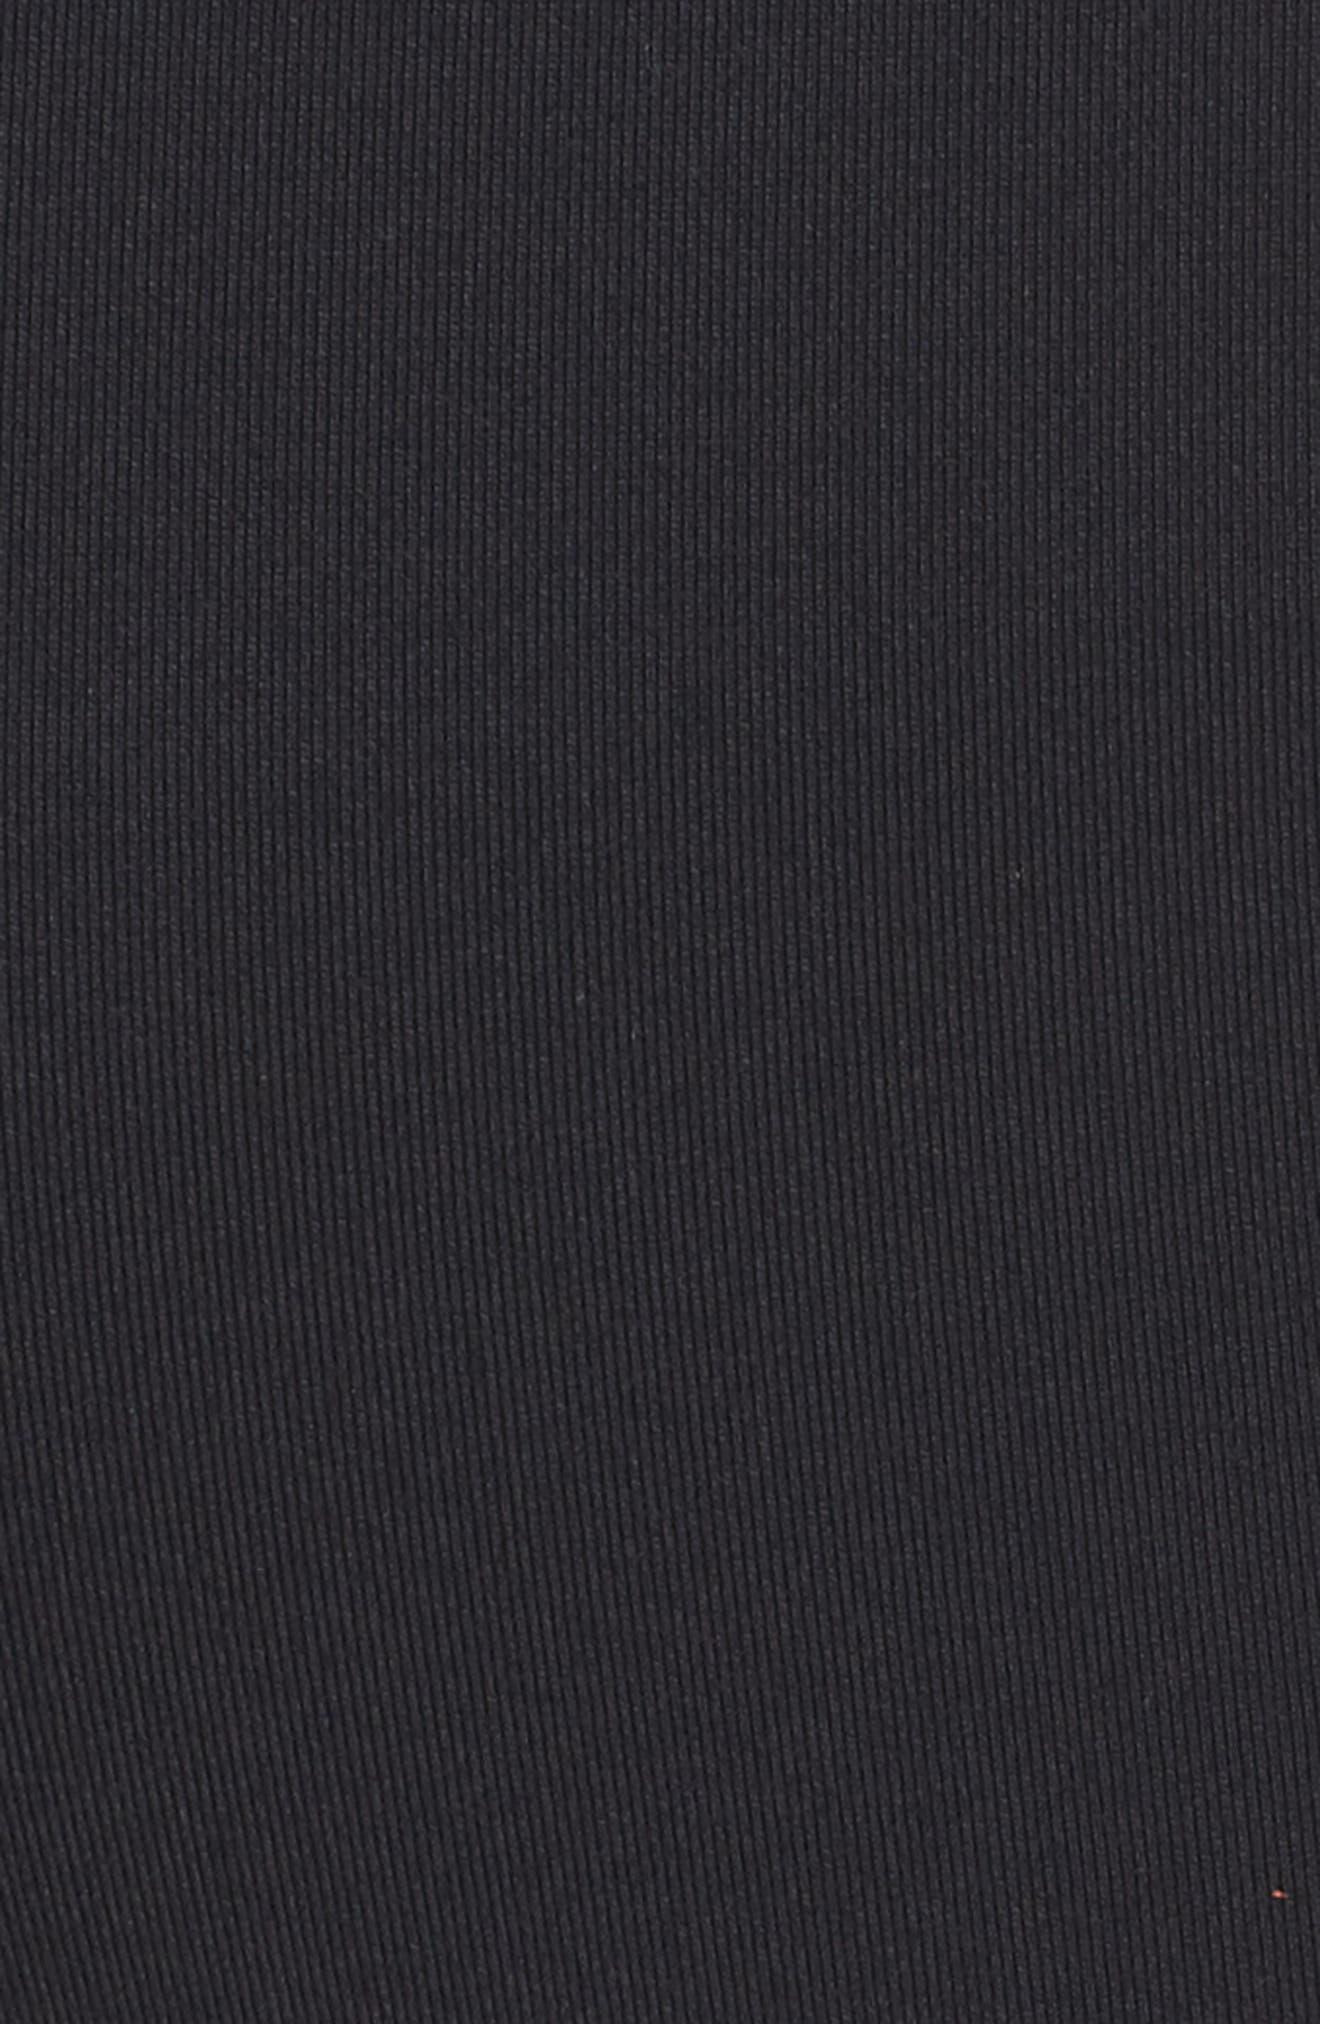 71149 High Waist Crop Leggings,                             Alternate thumbnail 6, color,                             Black